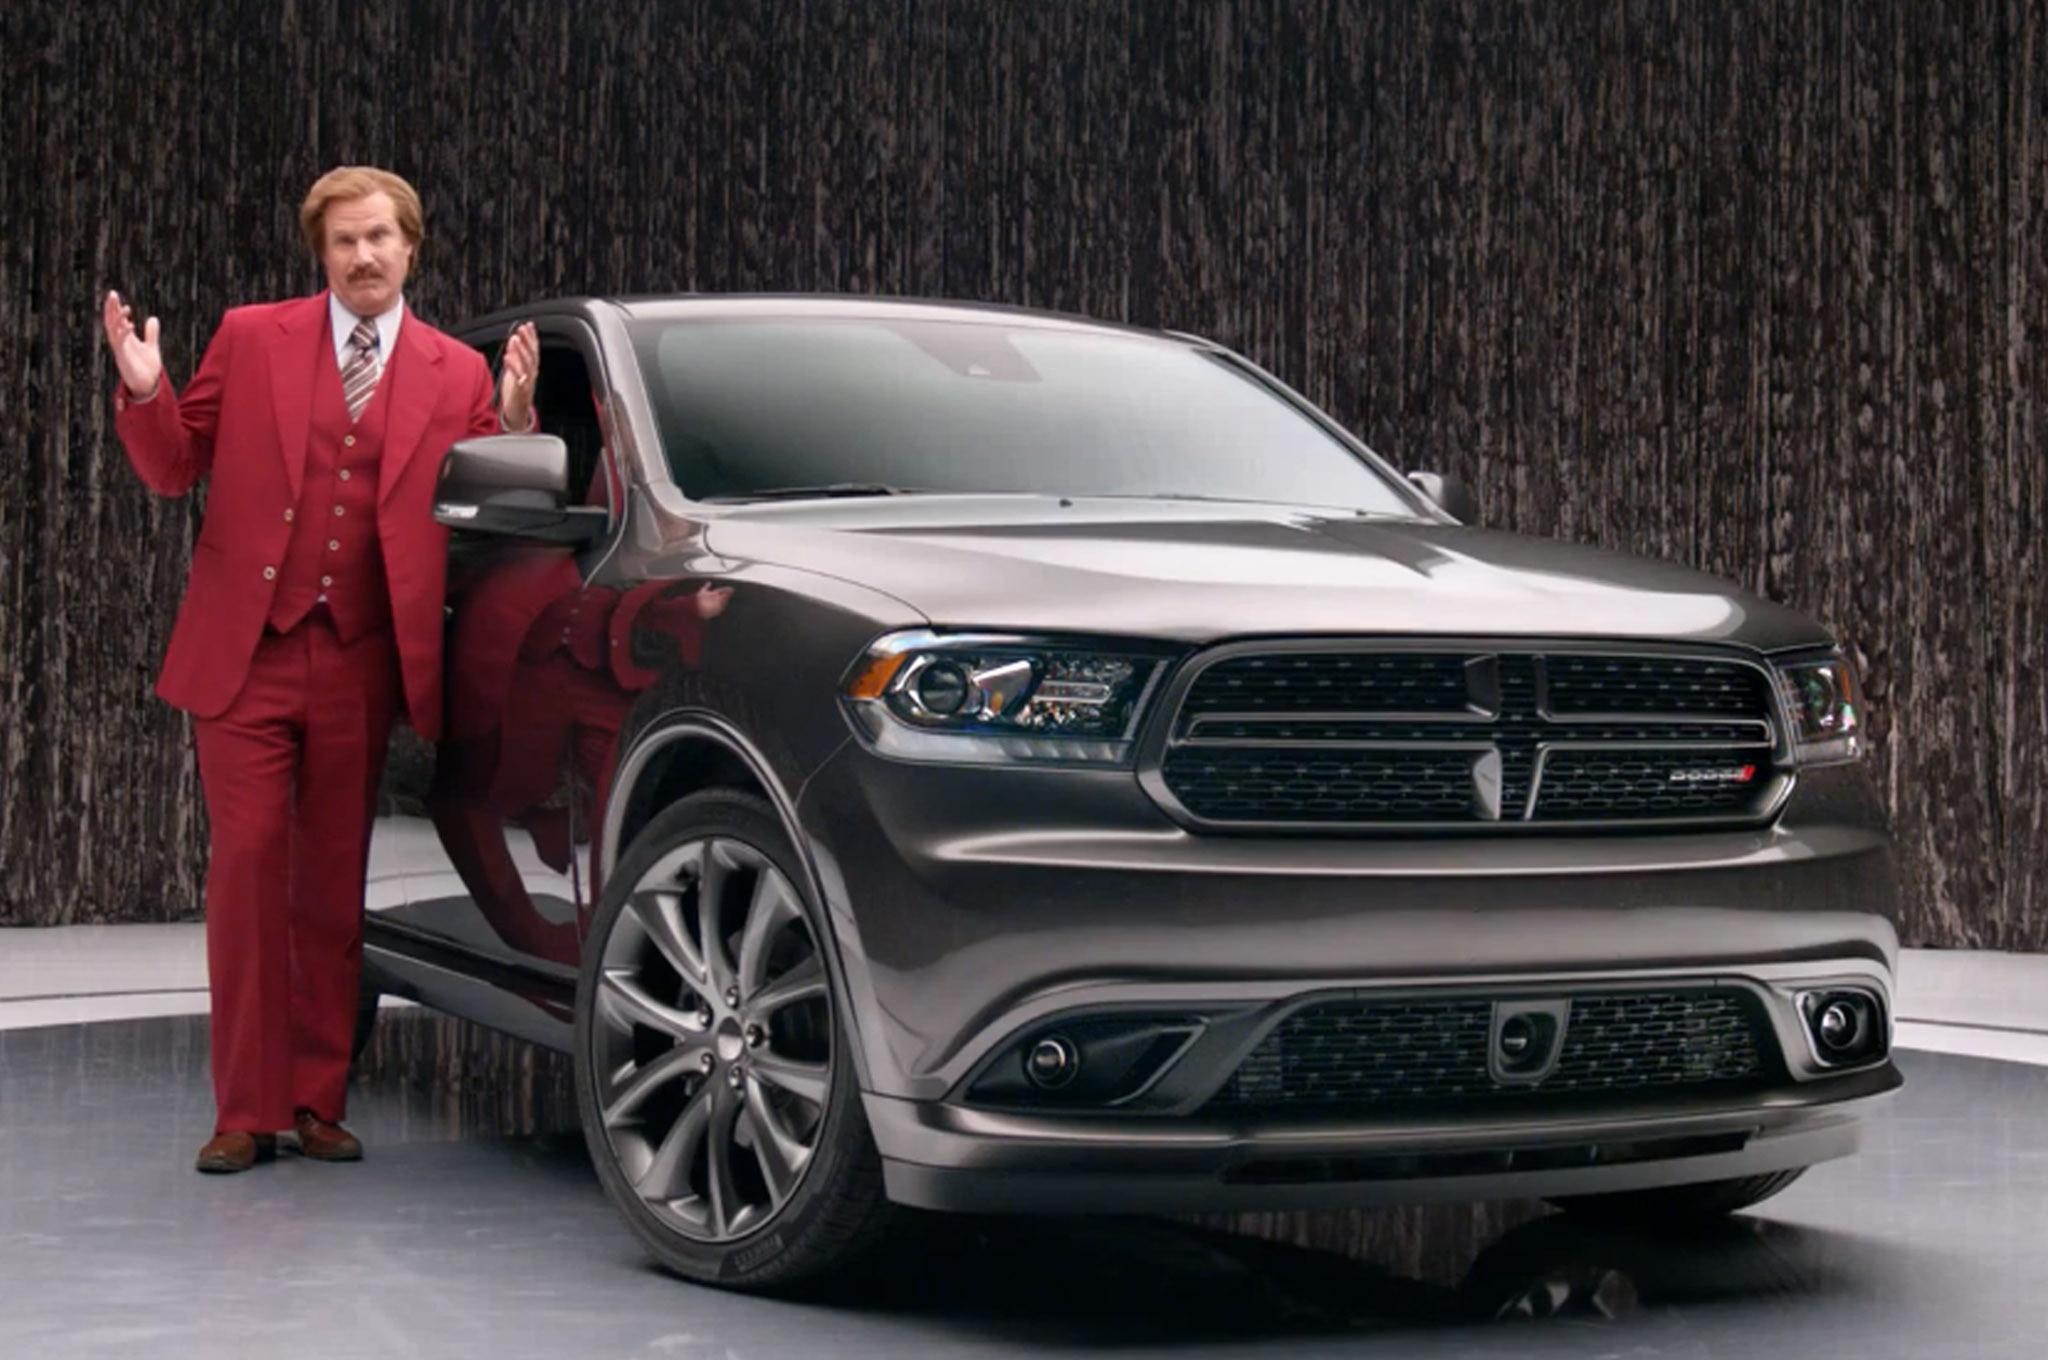 2014 Dodge Durango Ron Burgundy 2014 Auto Ad Awards